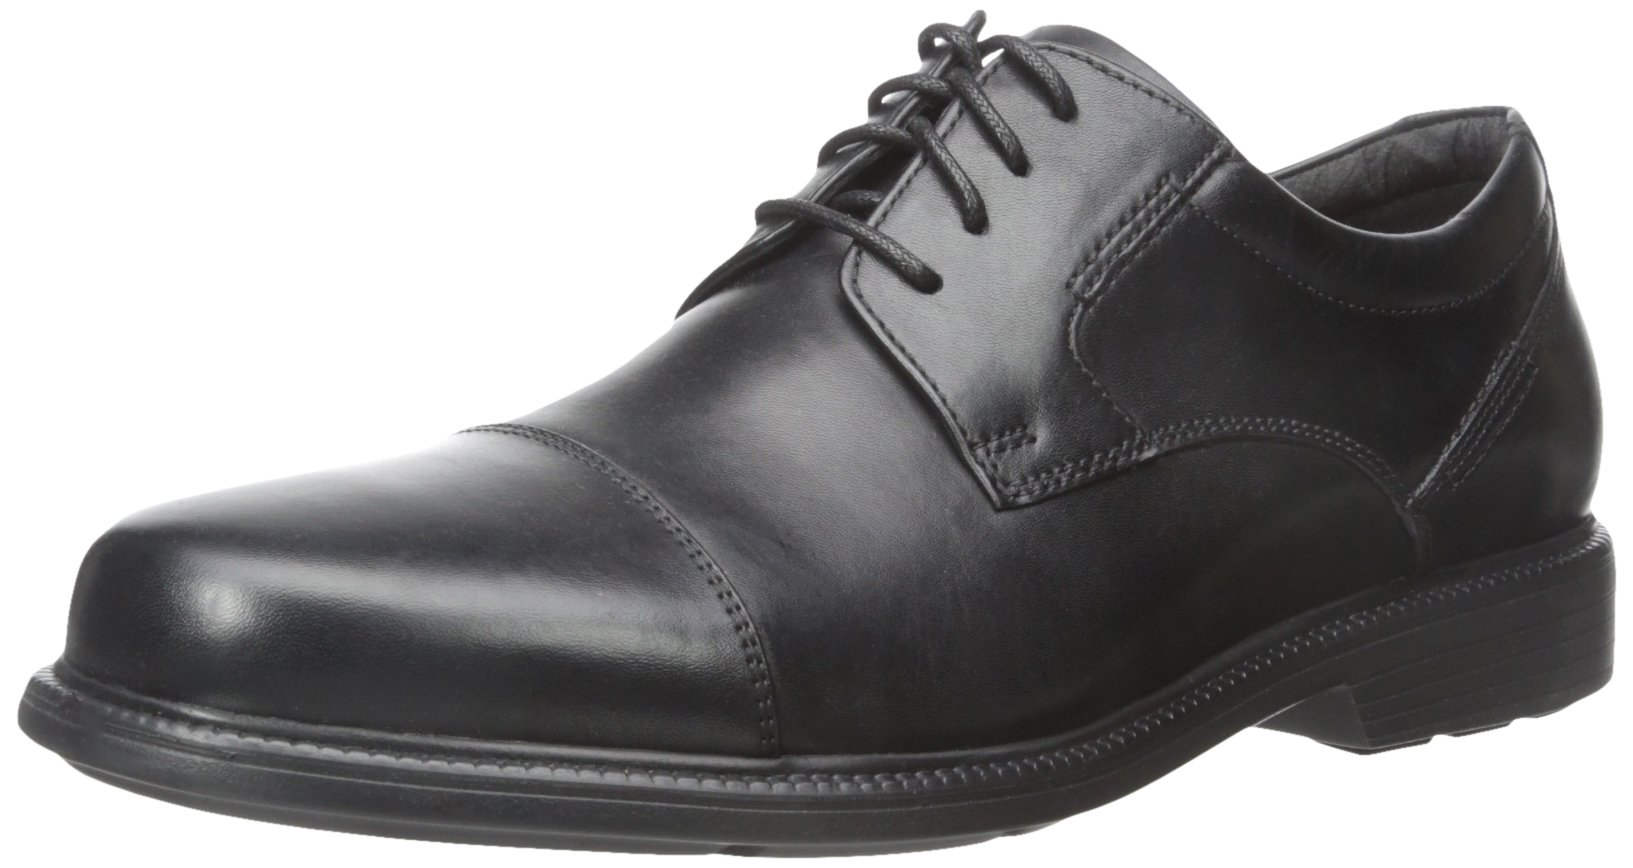 Rockport Men's Charles Road Cap Toe Oxford Black Leather 9.5 M (D)-9.5  M